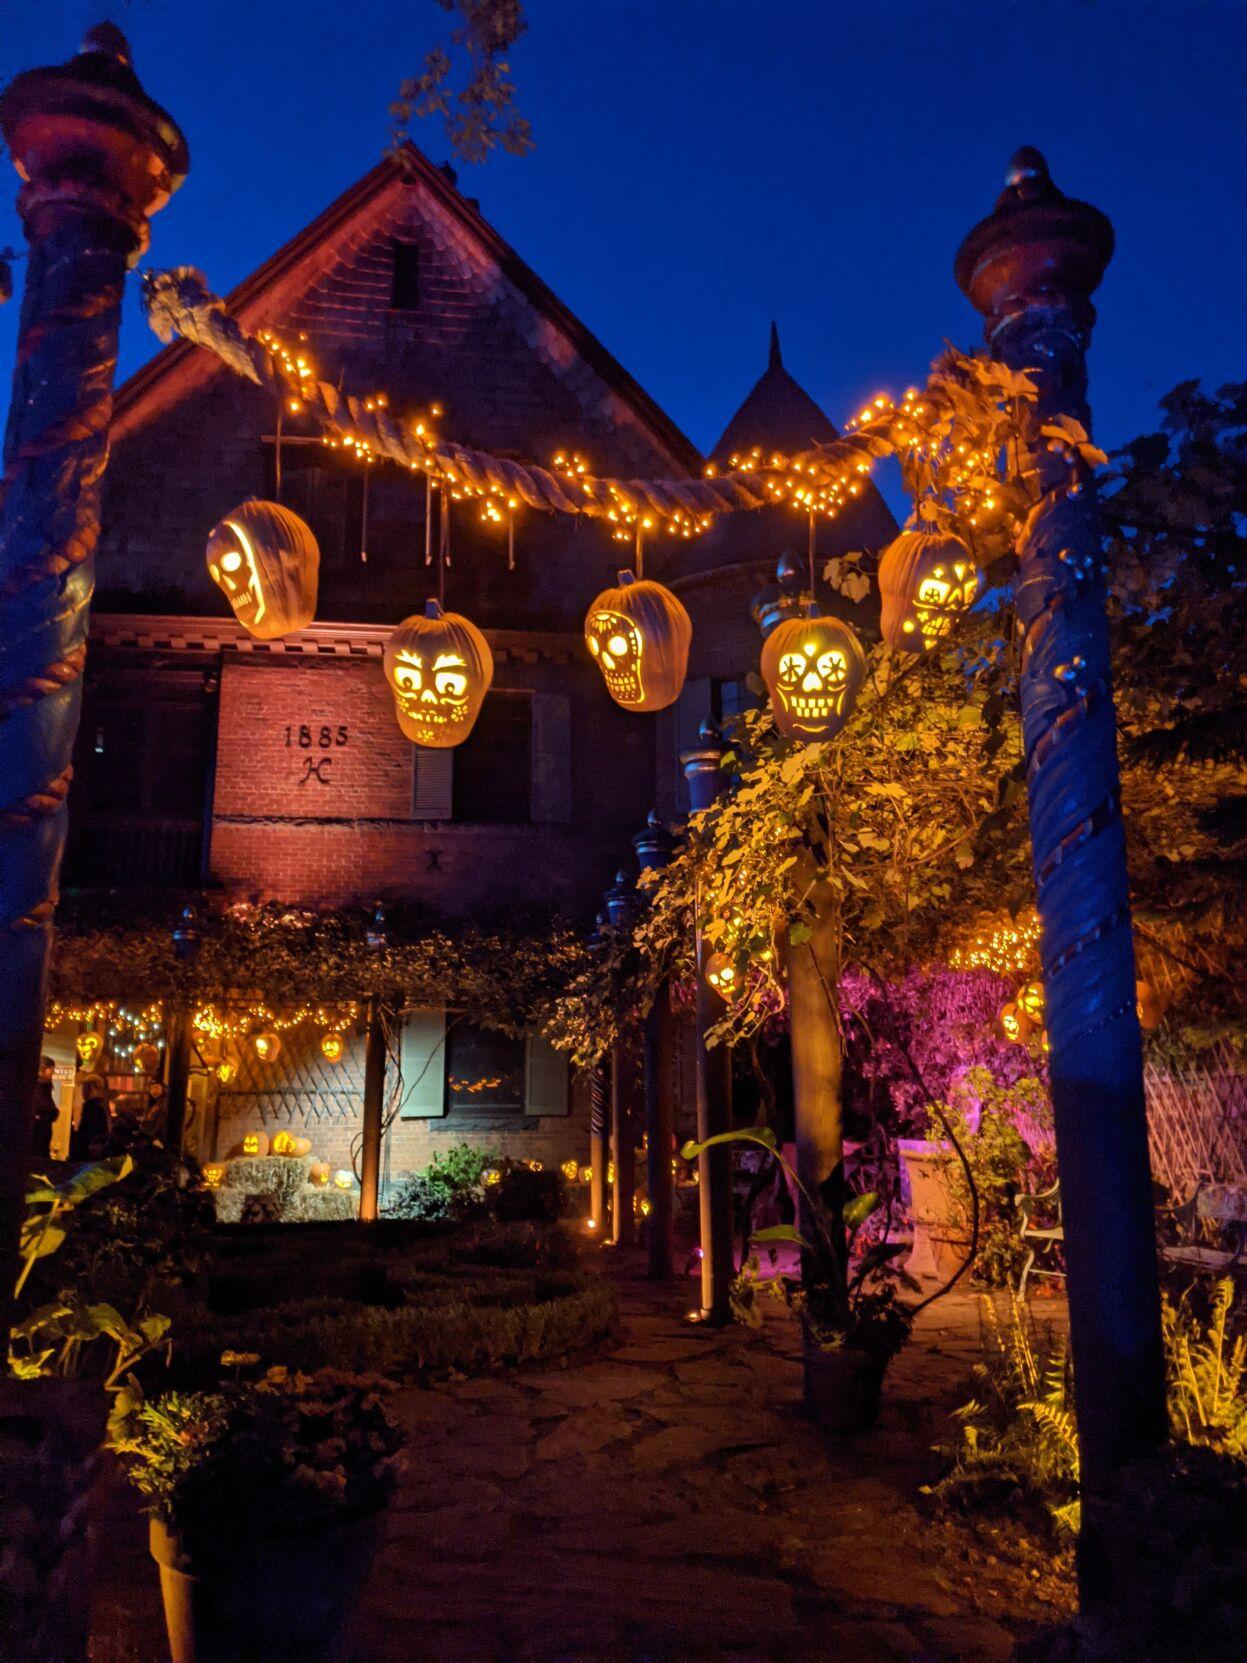 Pumpkins hang from trellis